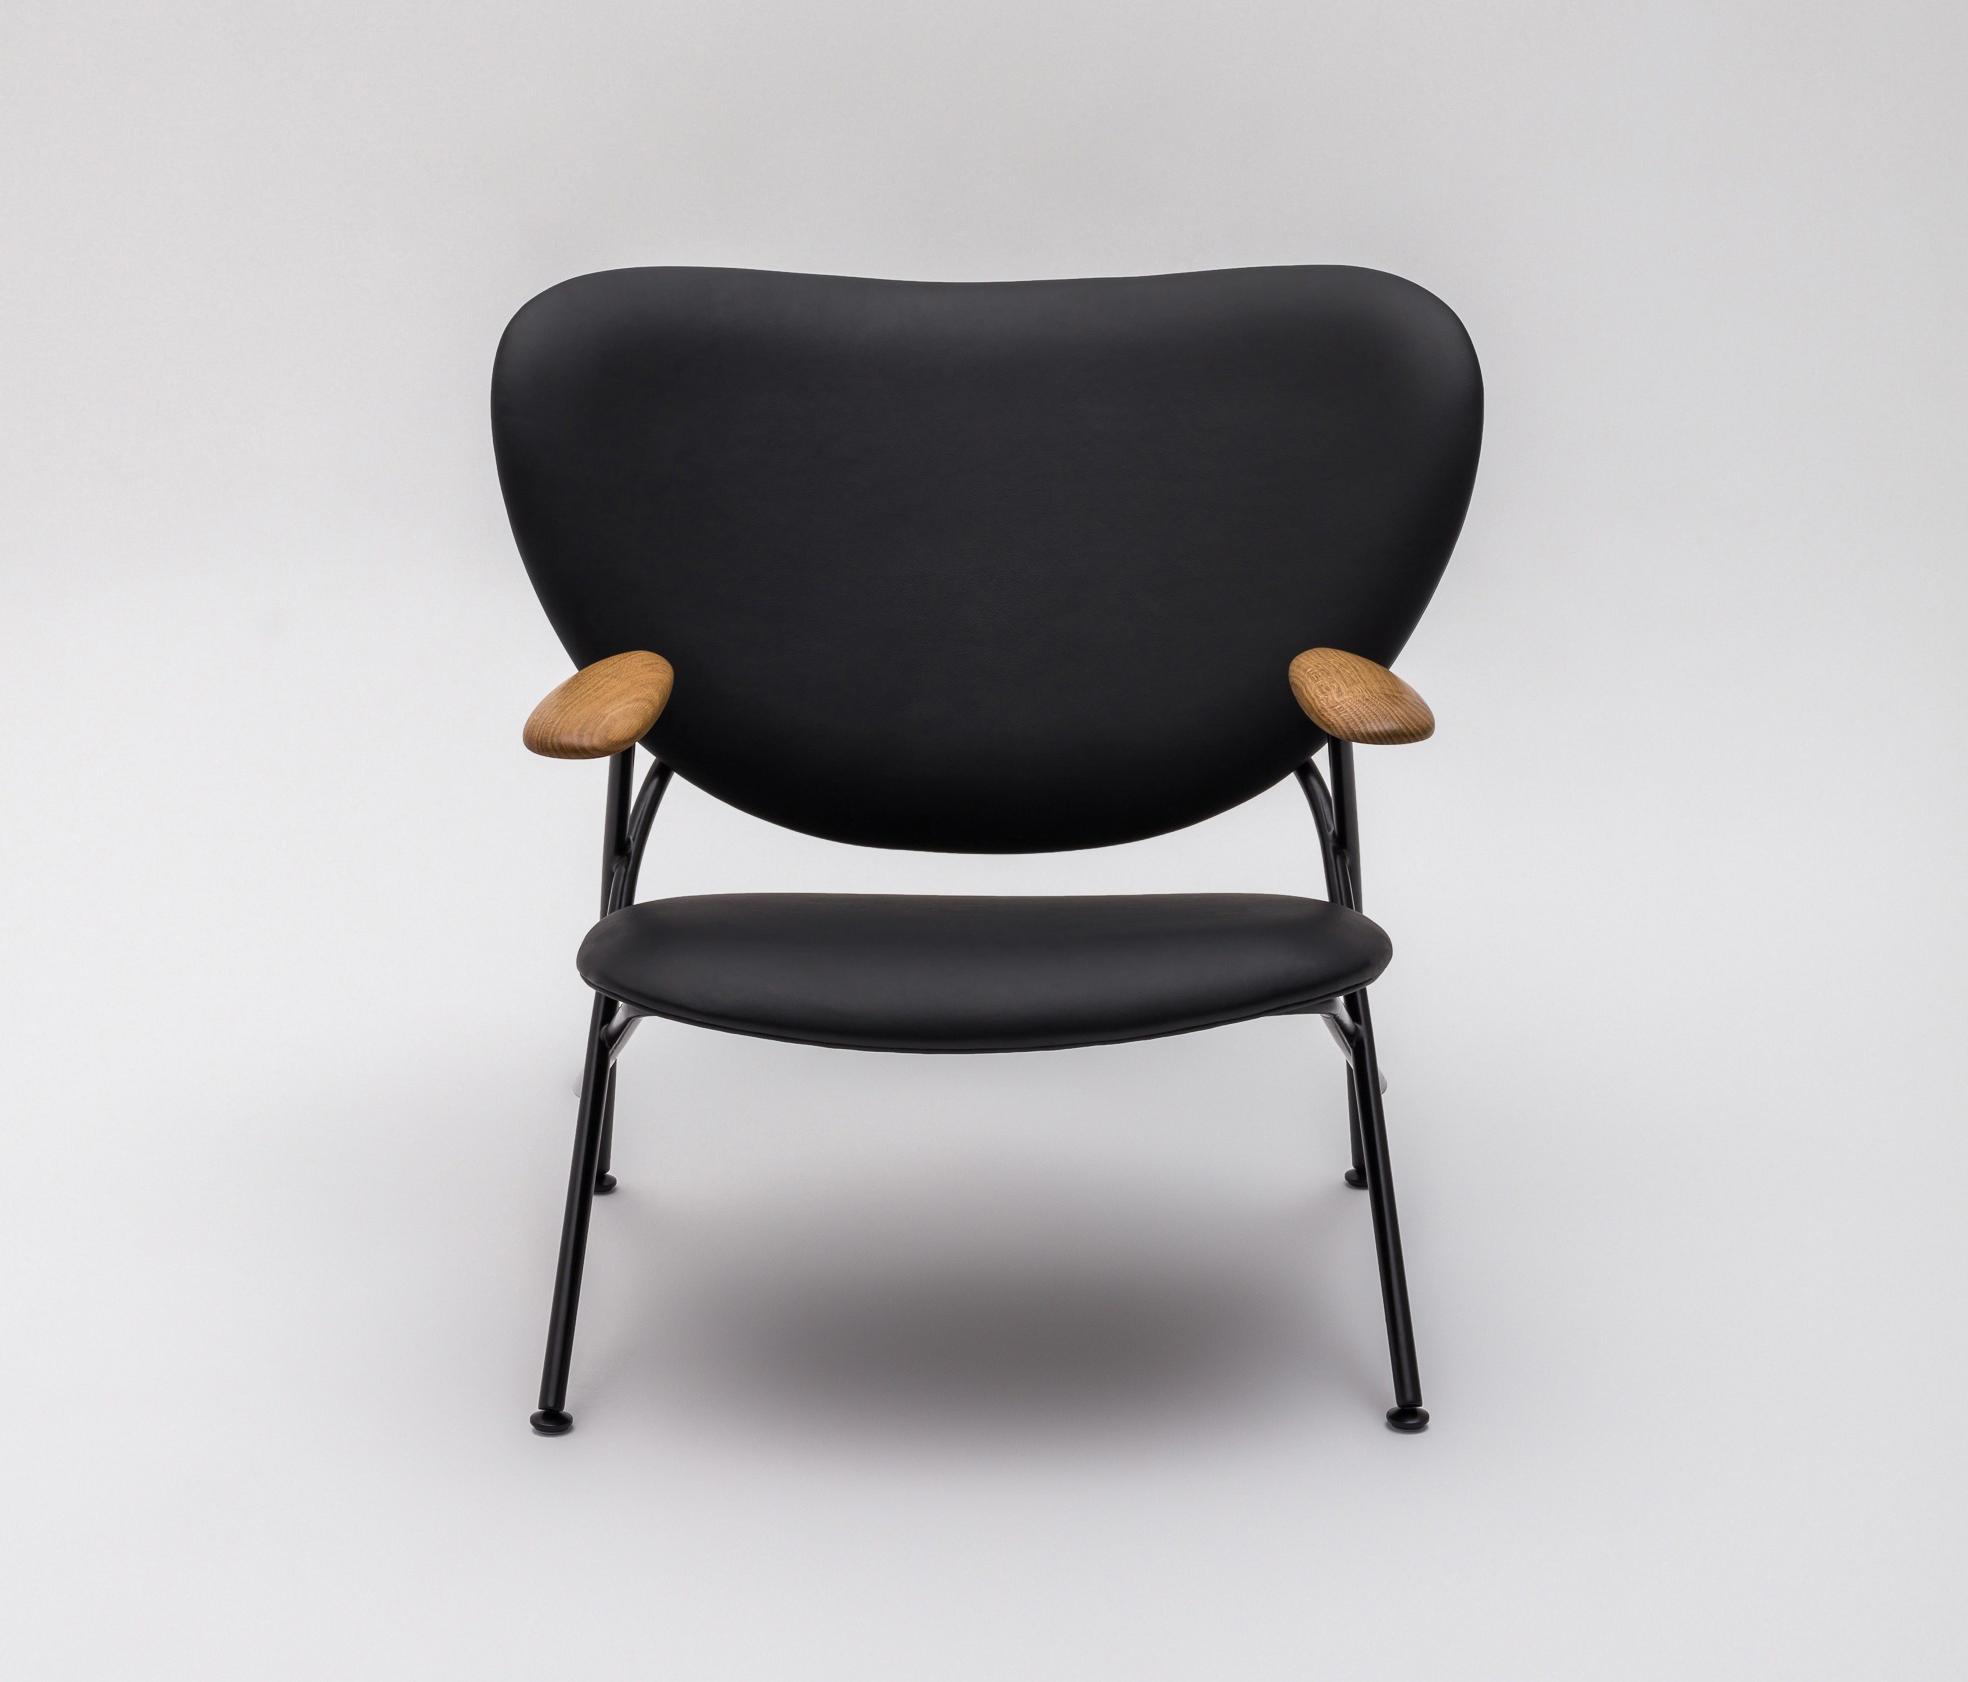 calder armchair with wooden